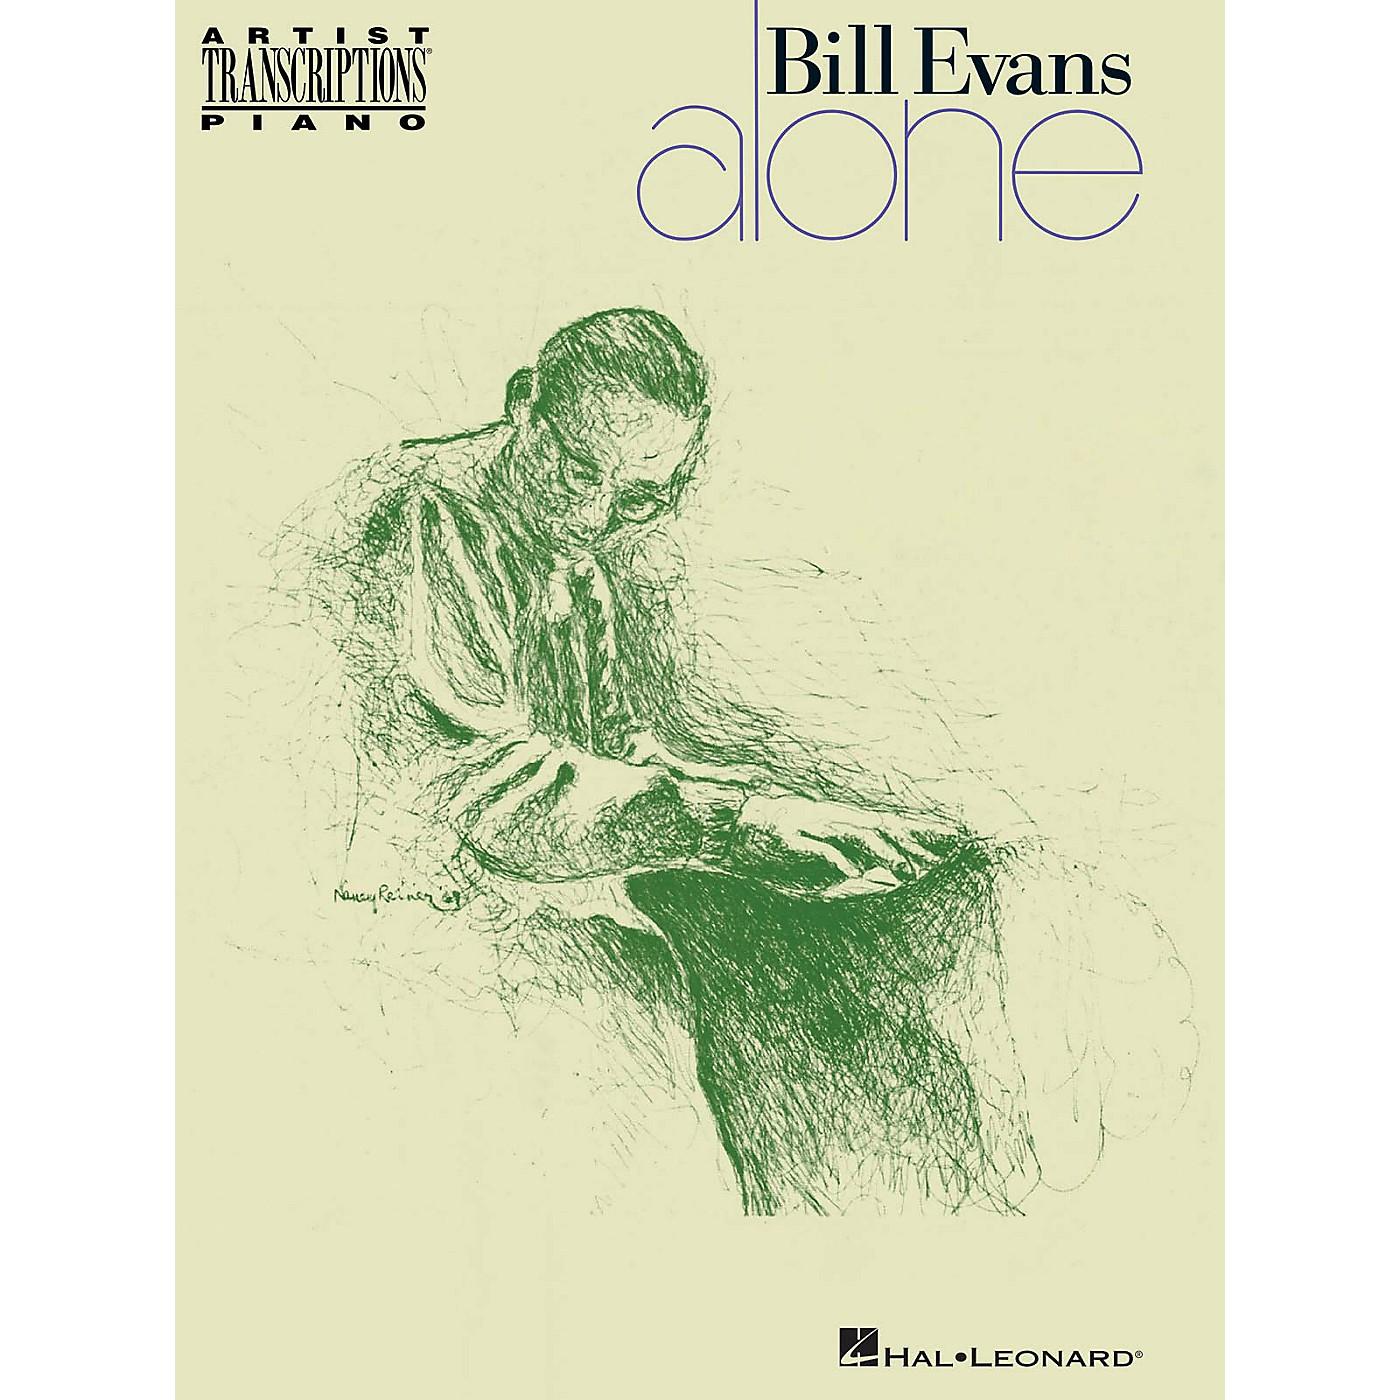 Hal Leonard Bill Evans - Alone Artist Transcriptions Series Softcover Performed by Bill Evans thumbnail